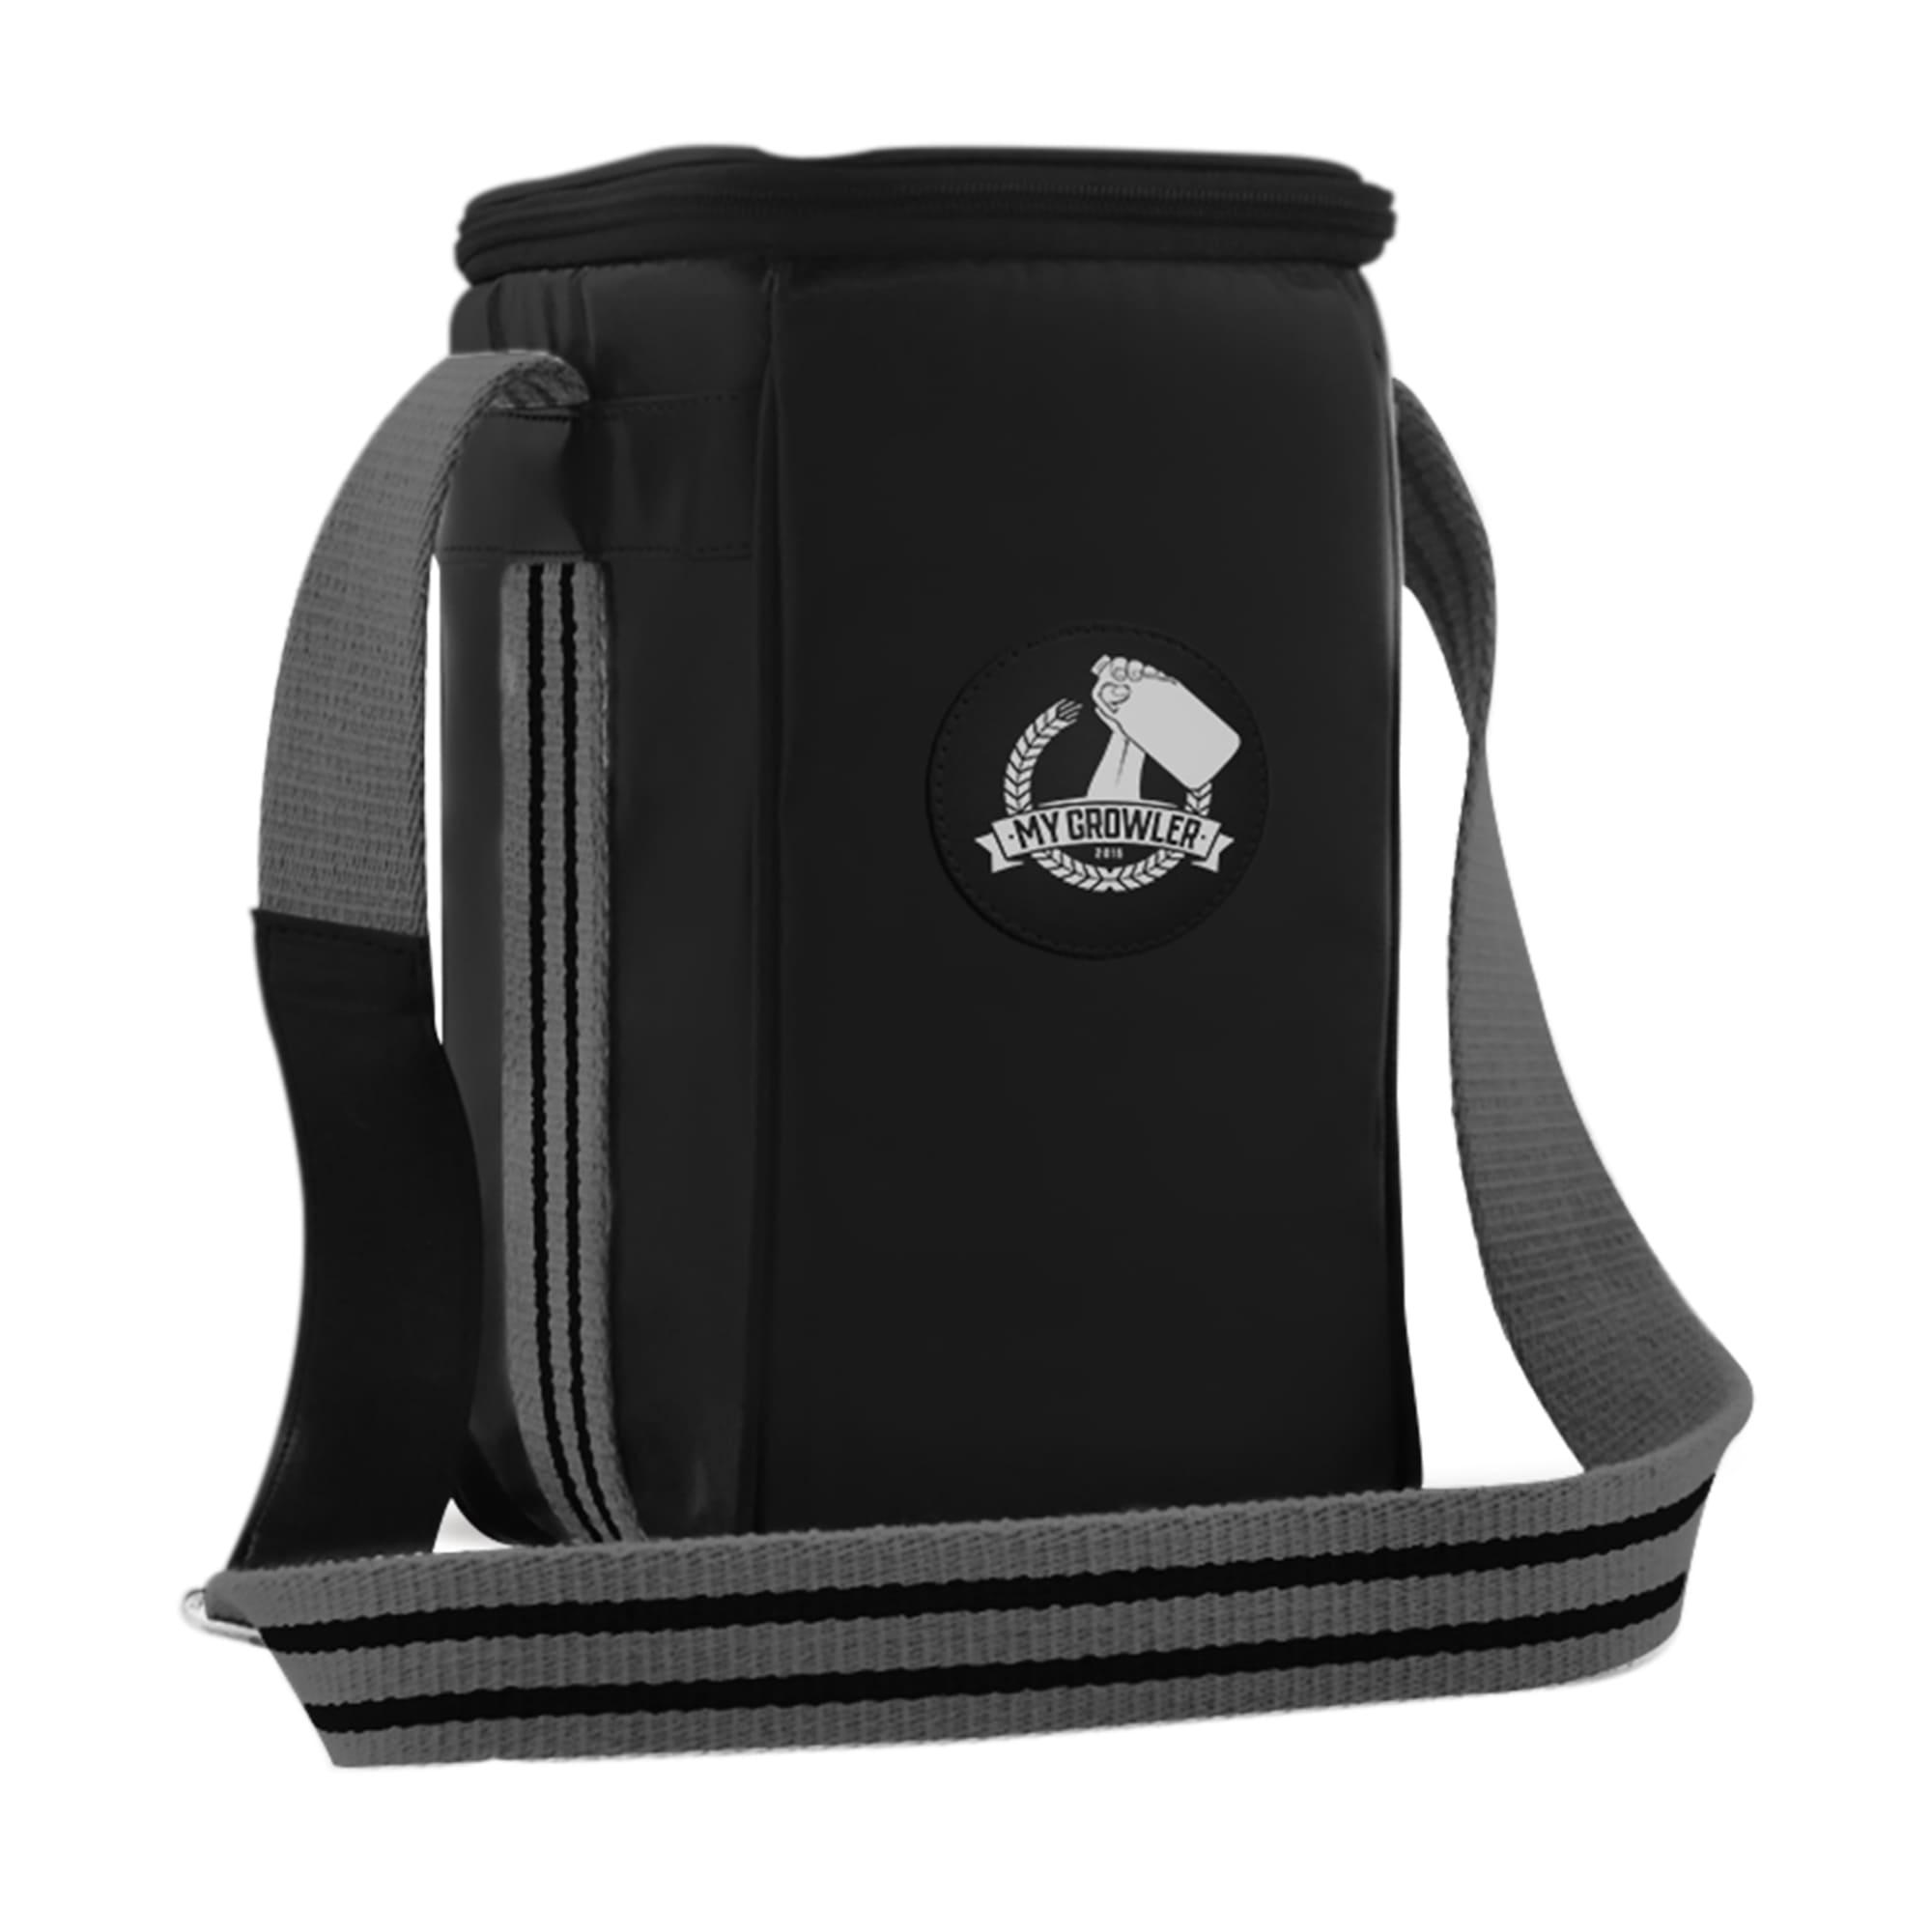 Growler Bag Travel para 1 growler - Preto